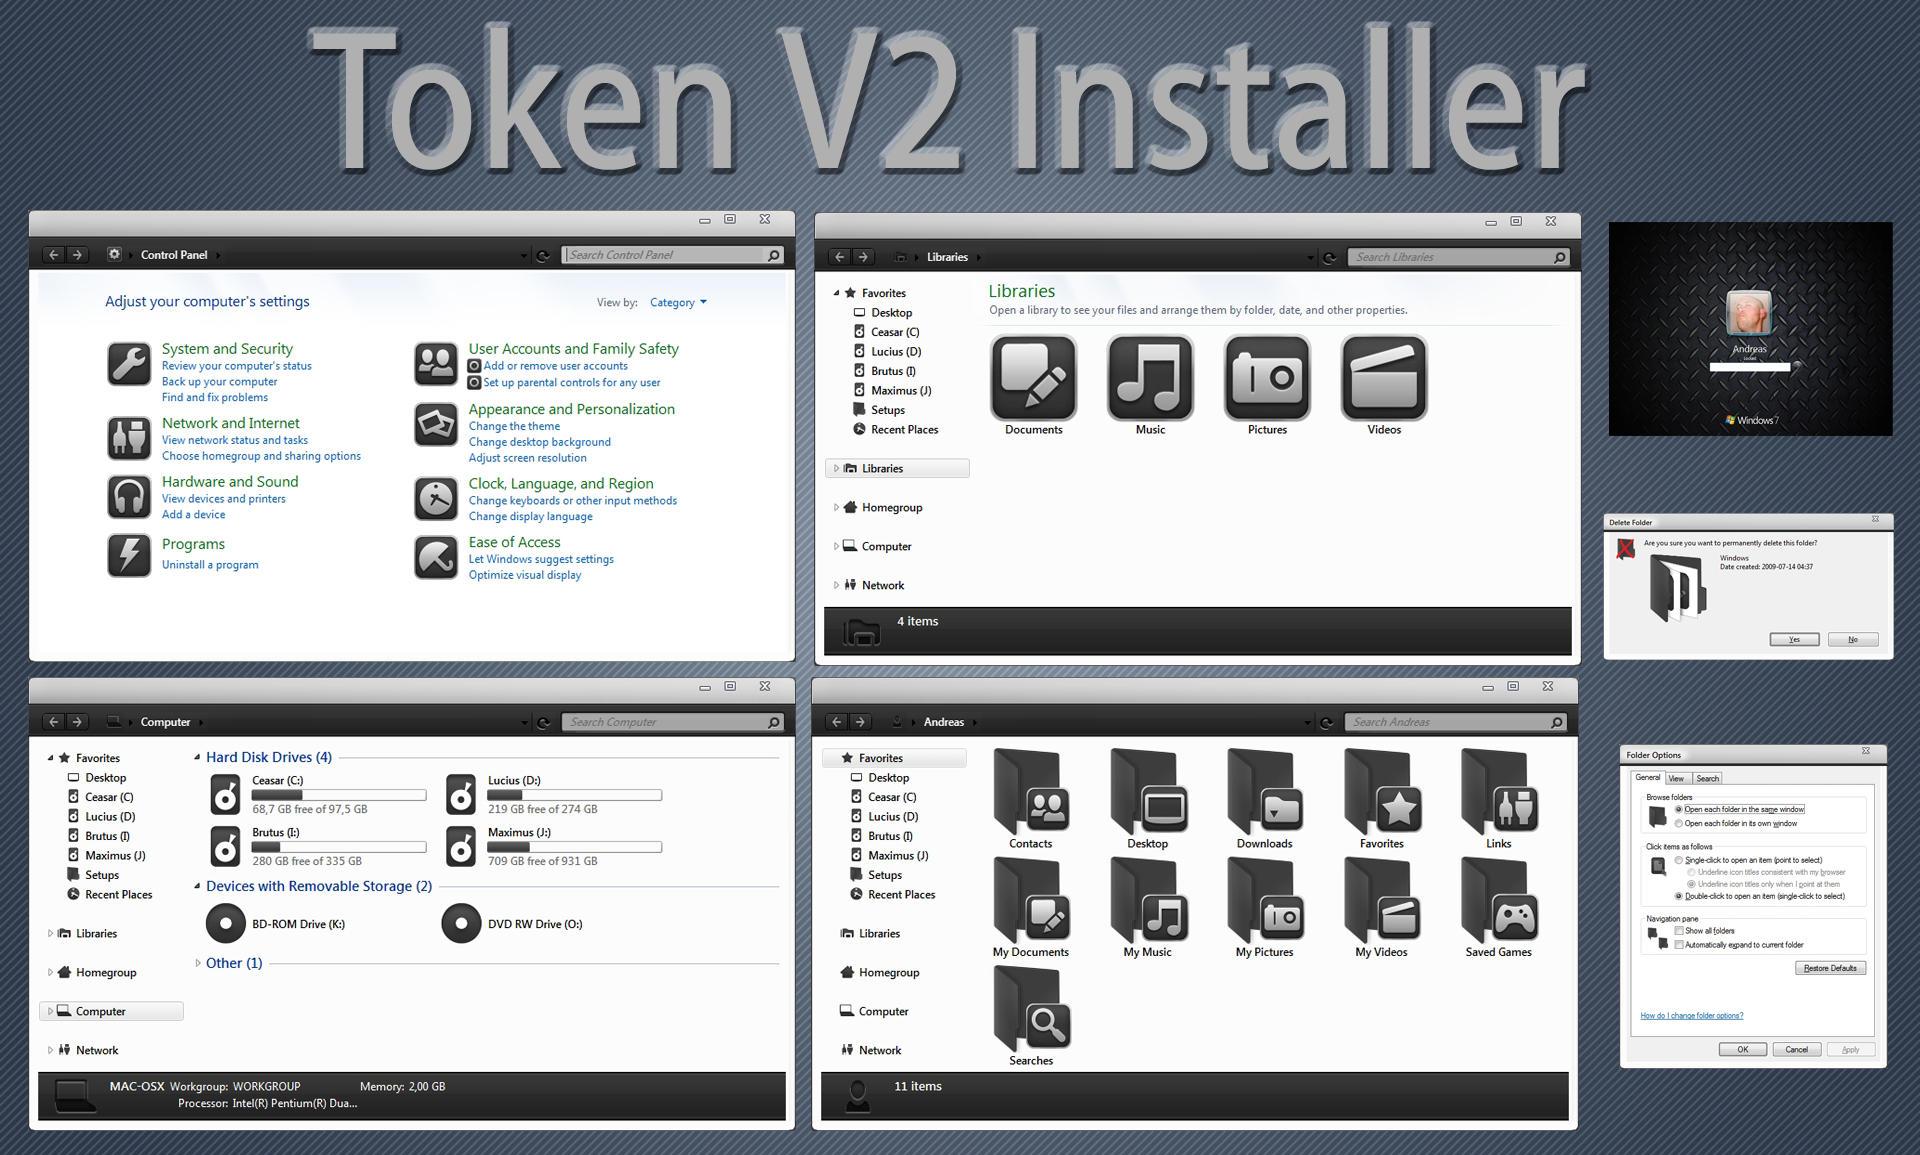 TokenV2 IconPack installer X86 by Mr-Ragnarok